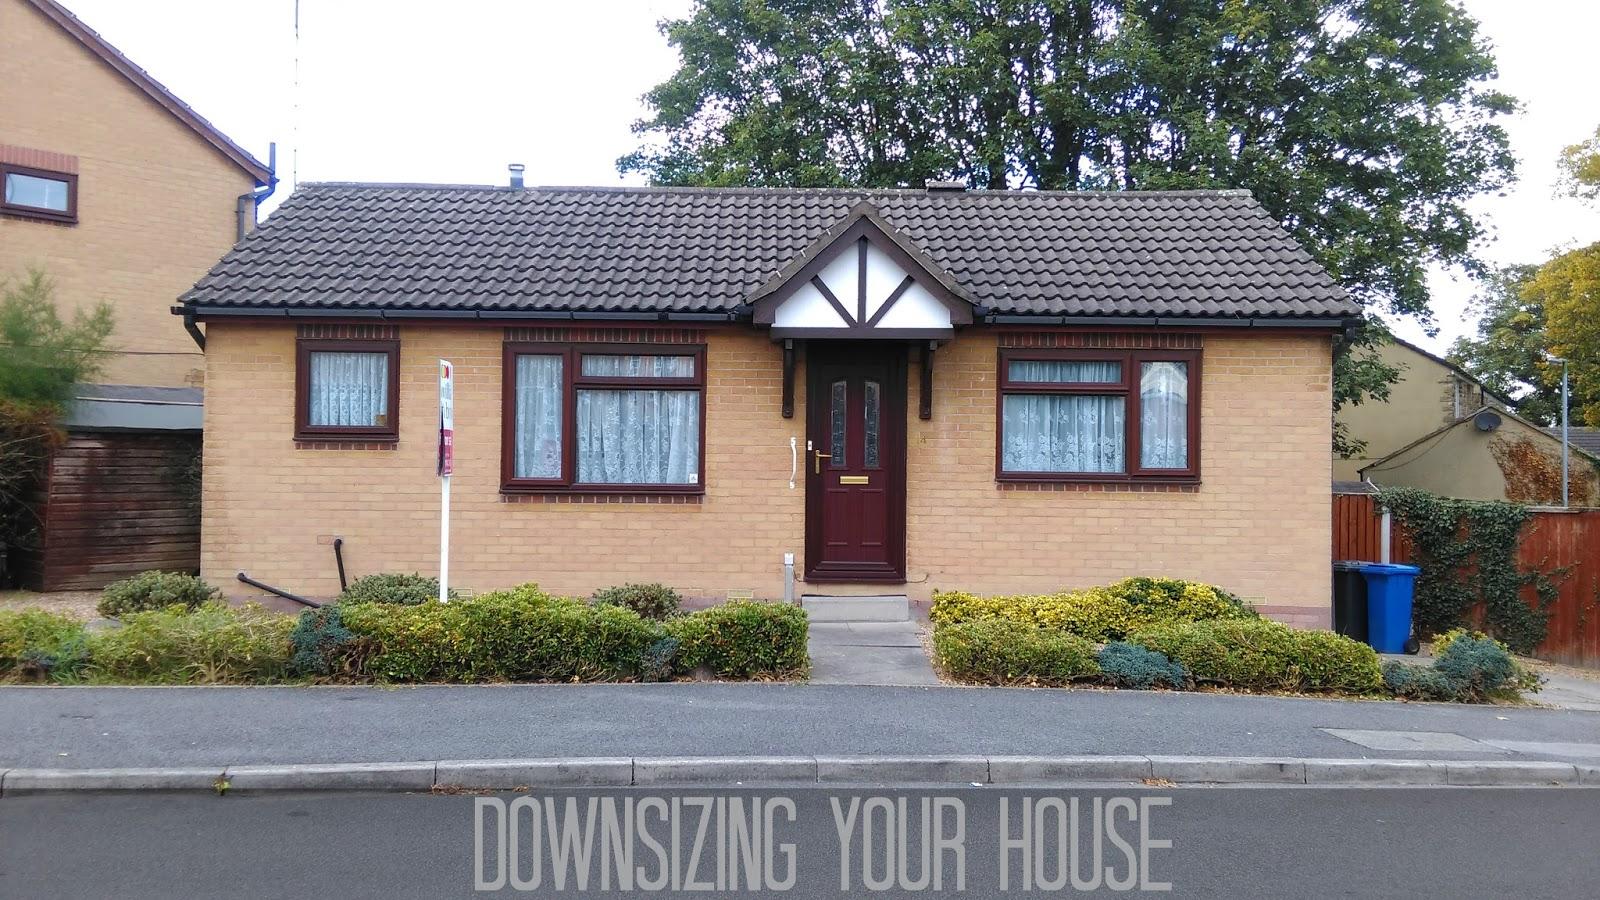 jibberjabberuk finance fridays downsizing your house